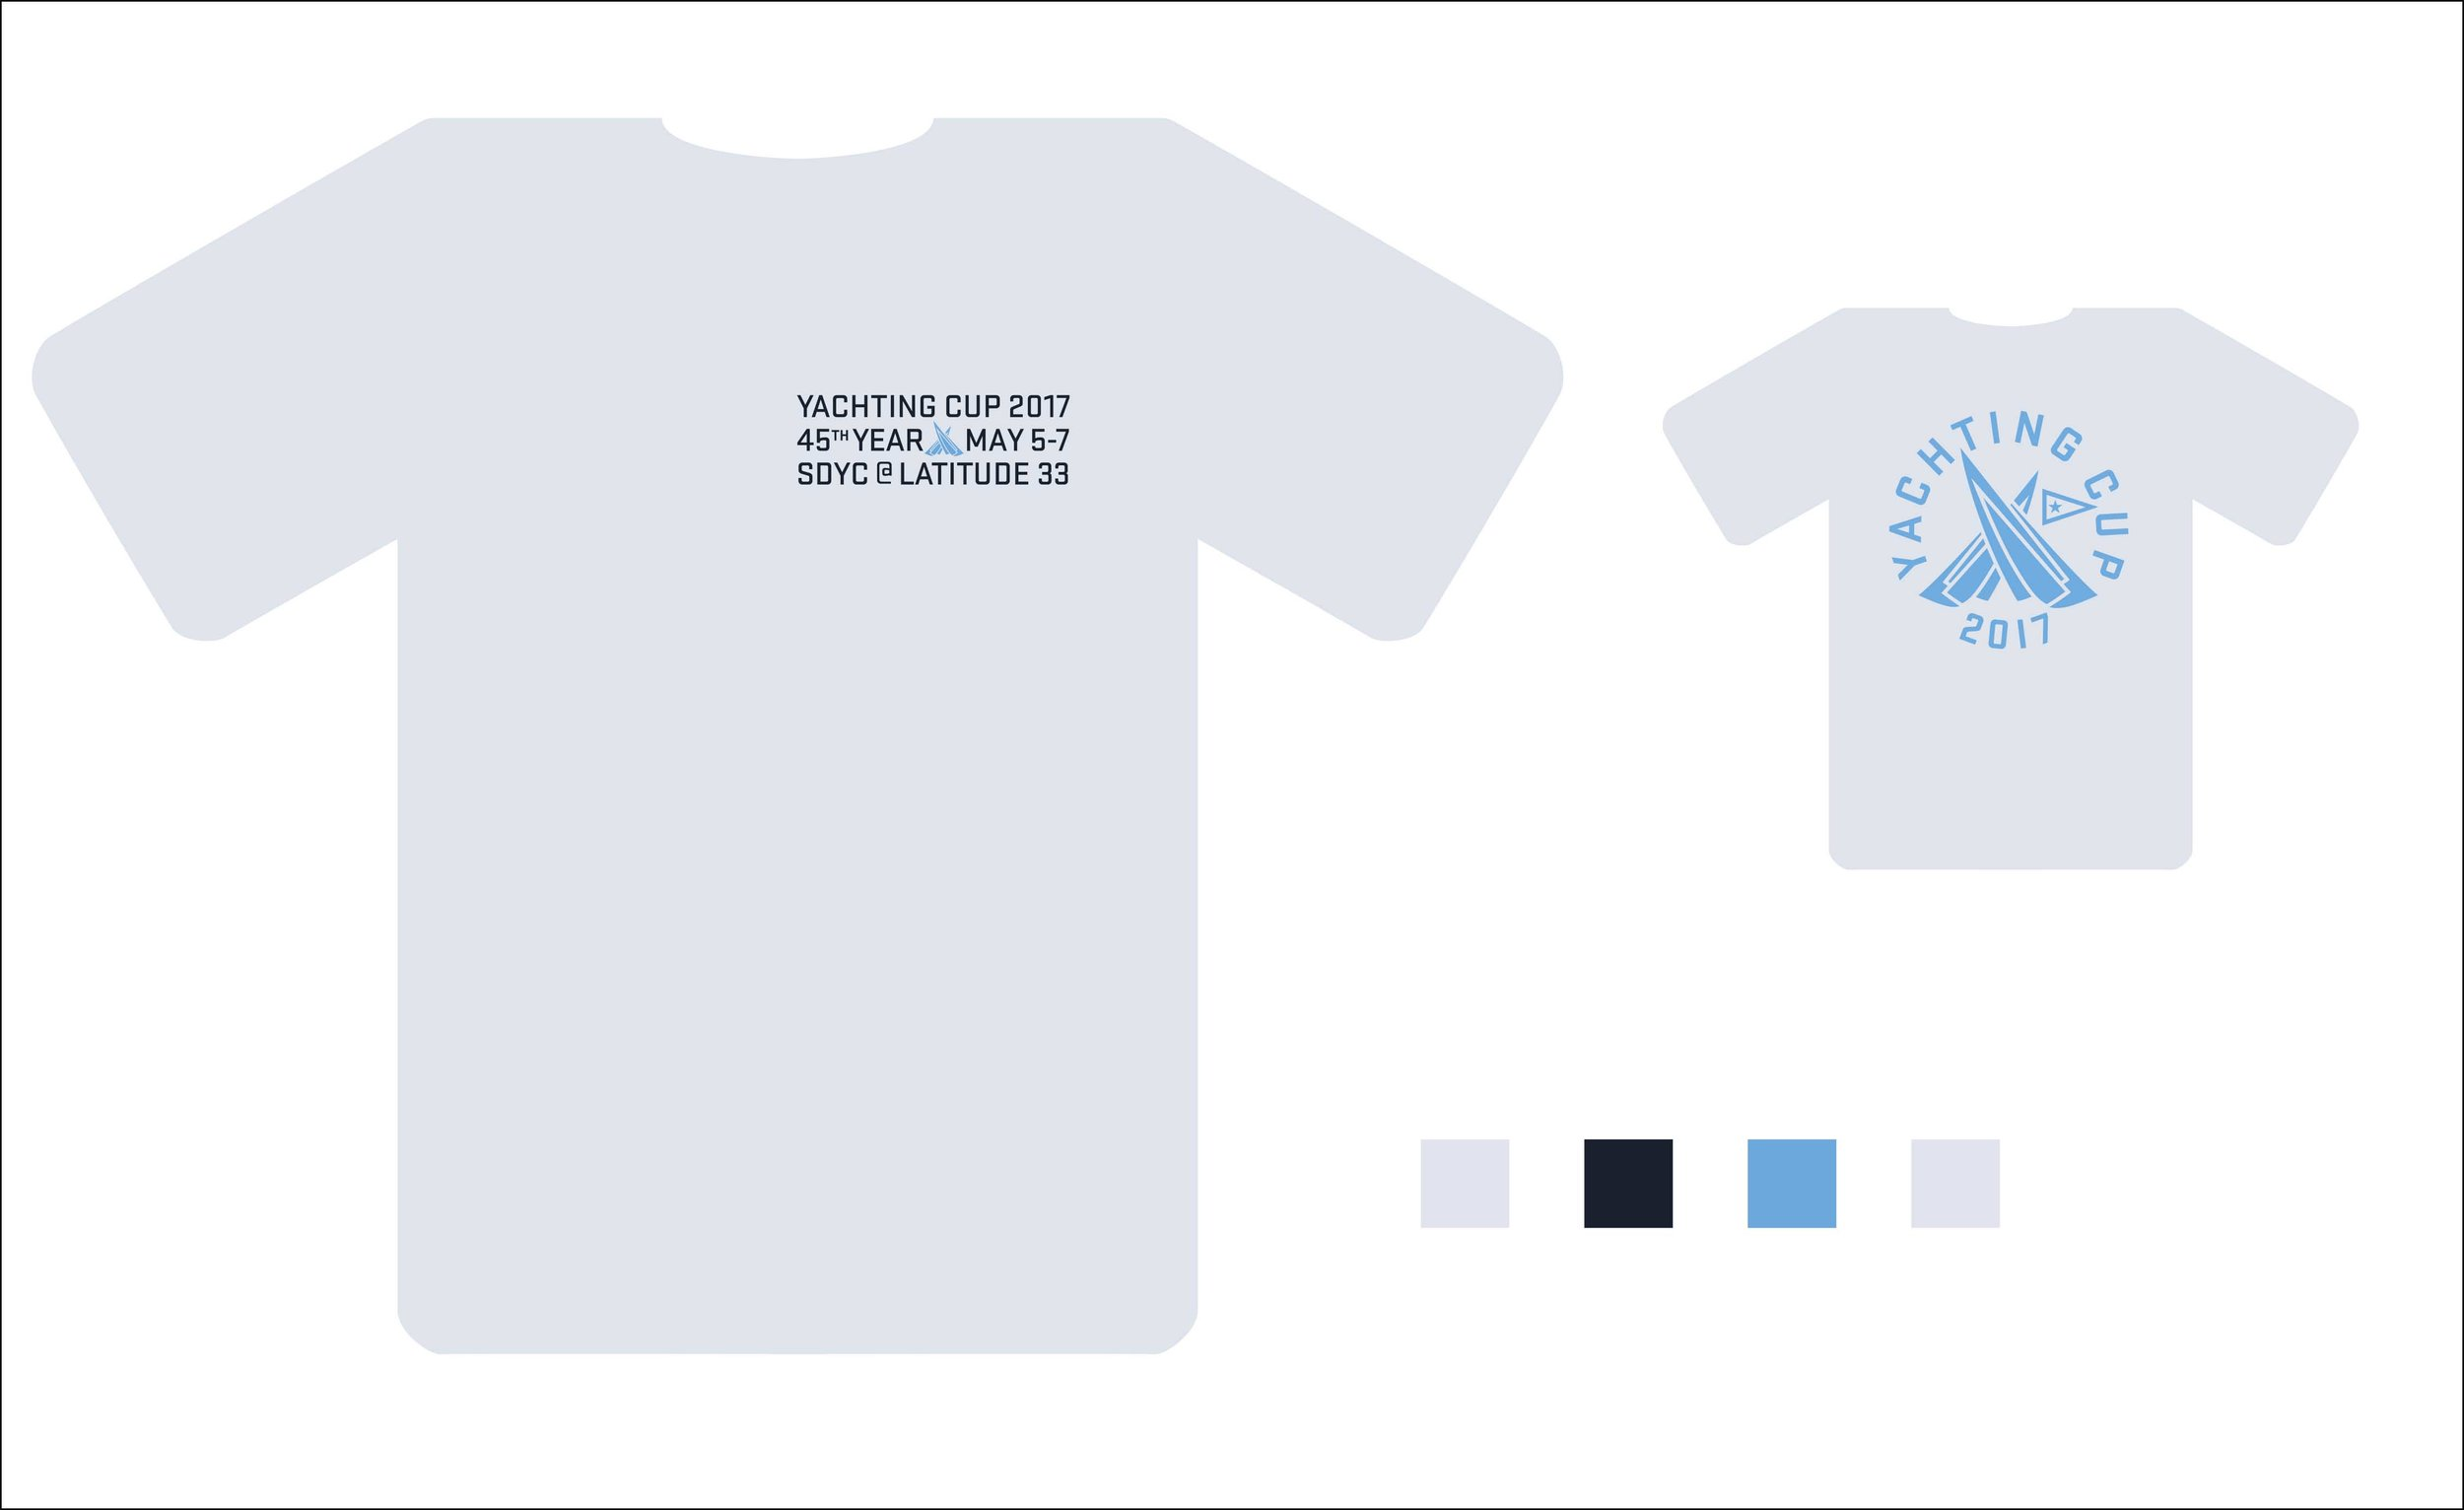 yc17_merch_LIGHTshirt_noBORDER_rgc.jpg